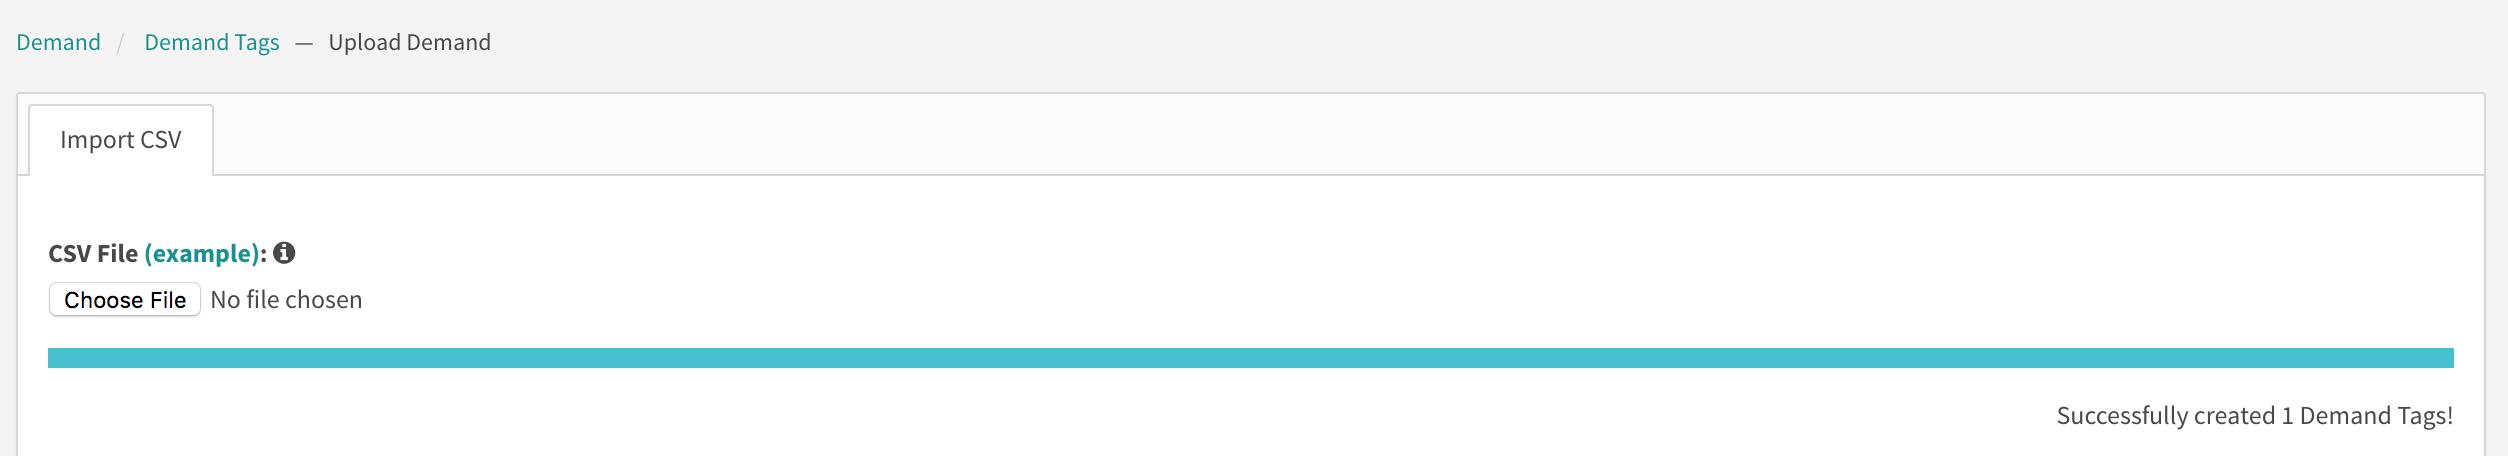 upload demand progress bar